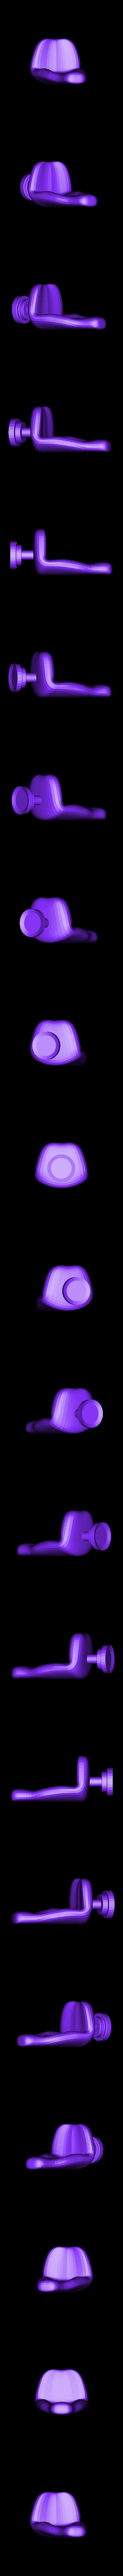 CP_03 (rep).stl Download free STL file Millenium Falcon, Cockpit.  • 3D printable object, Alex_x_x_x